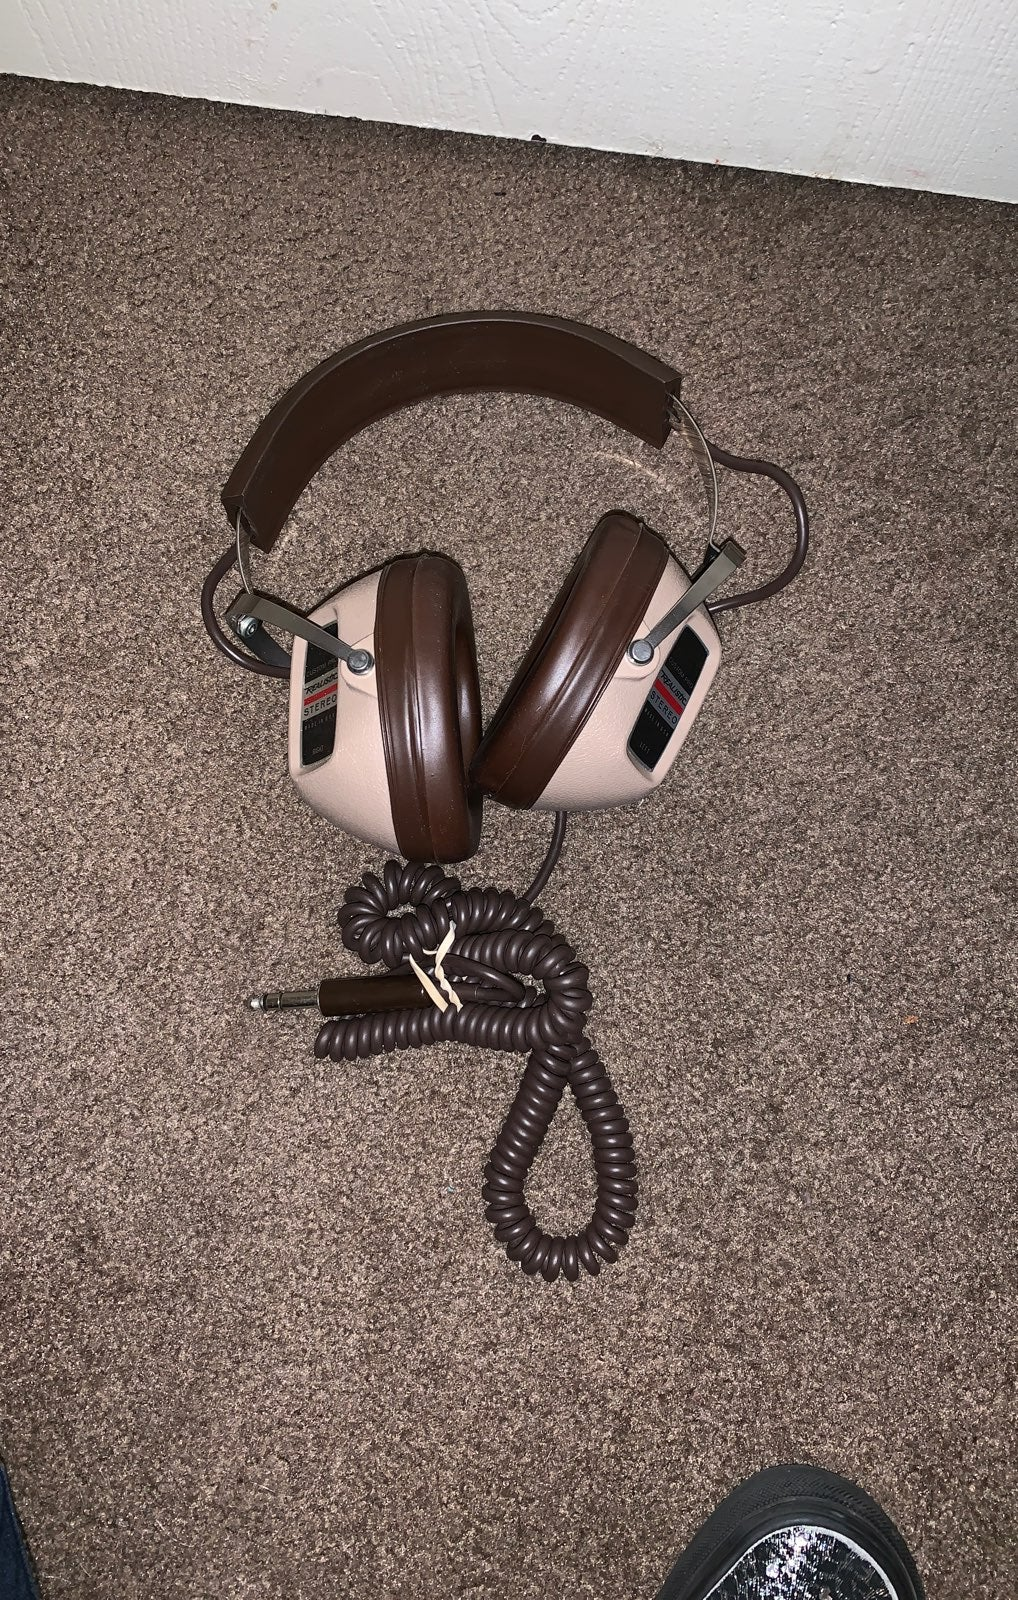 Pristine KOSS Headphones